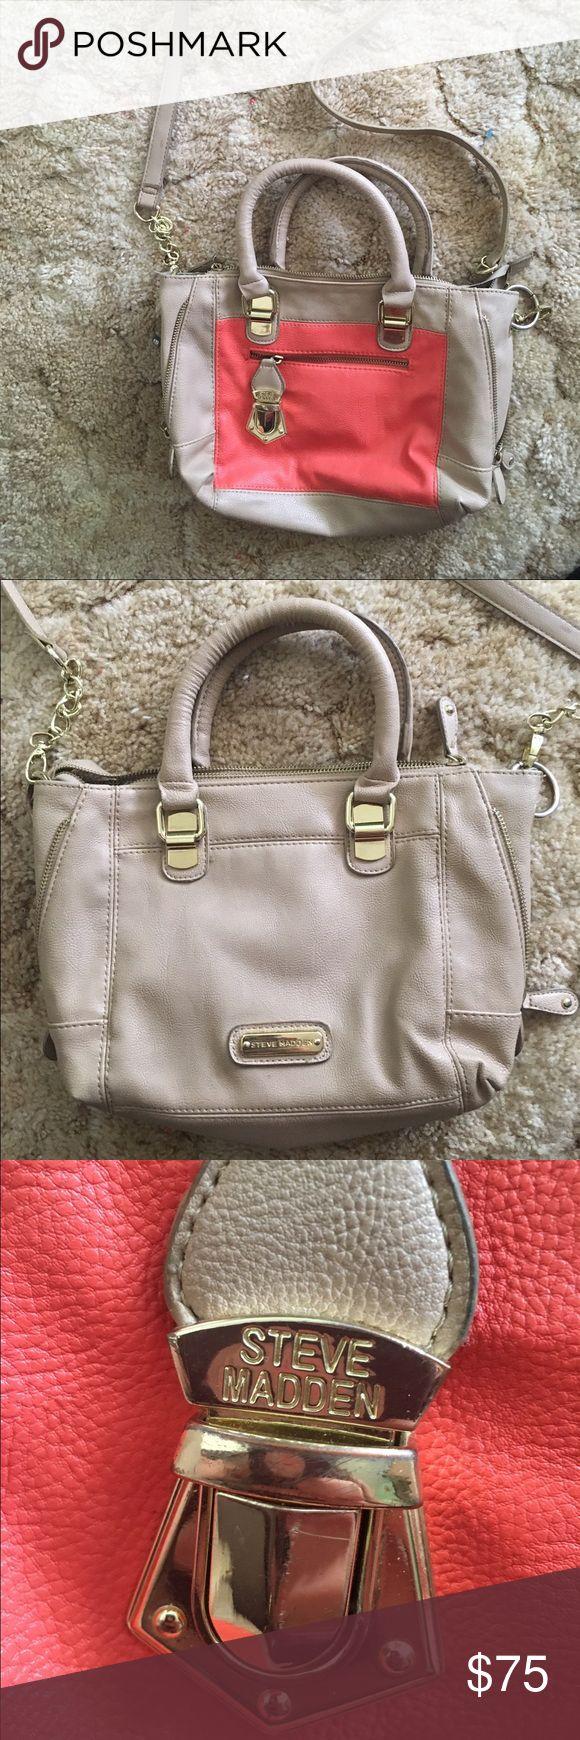 Steve Madden purse Cute dressy Steve Madden purse Steve Madden Bags Shoulder Bags